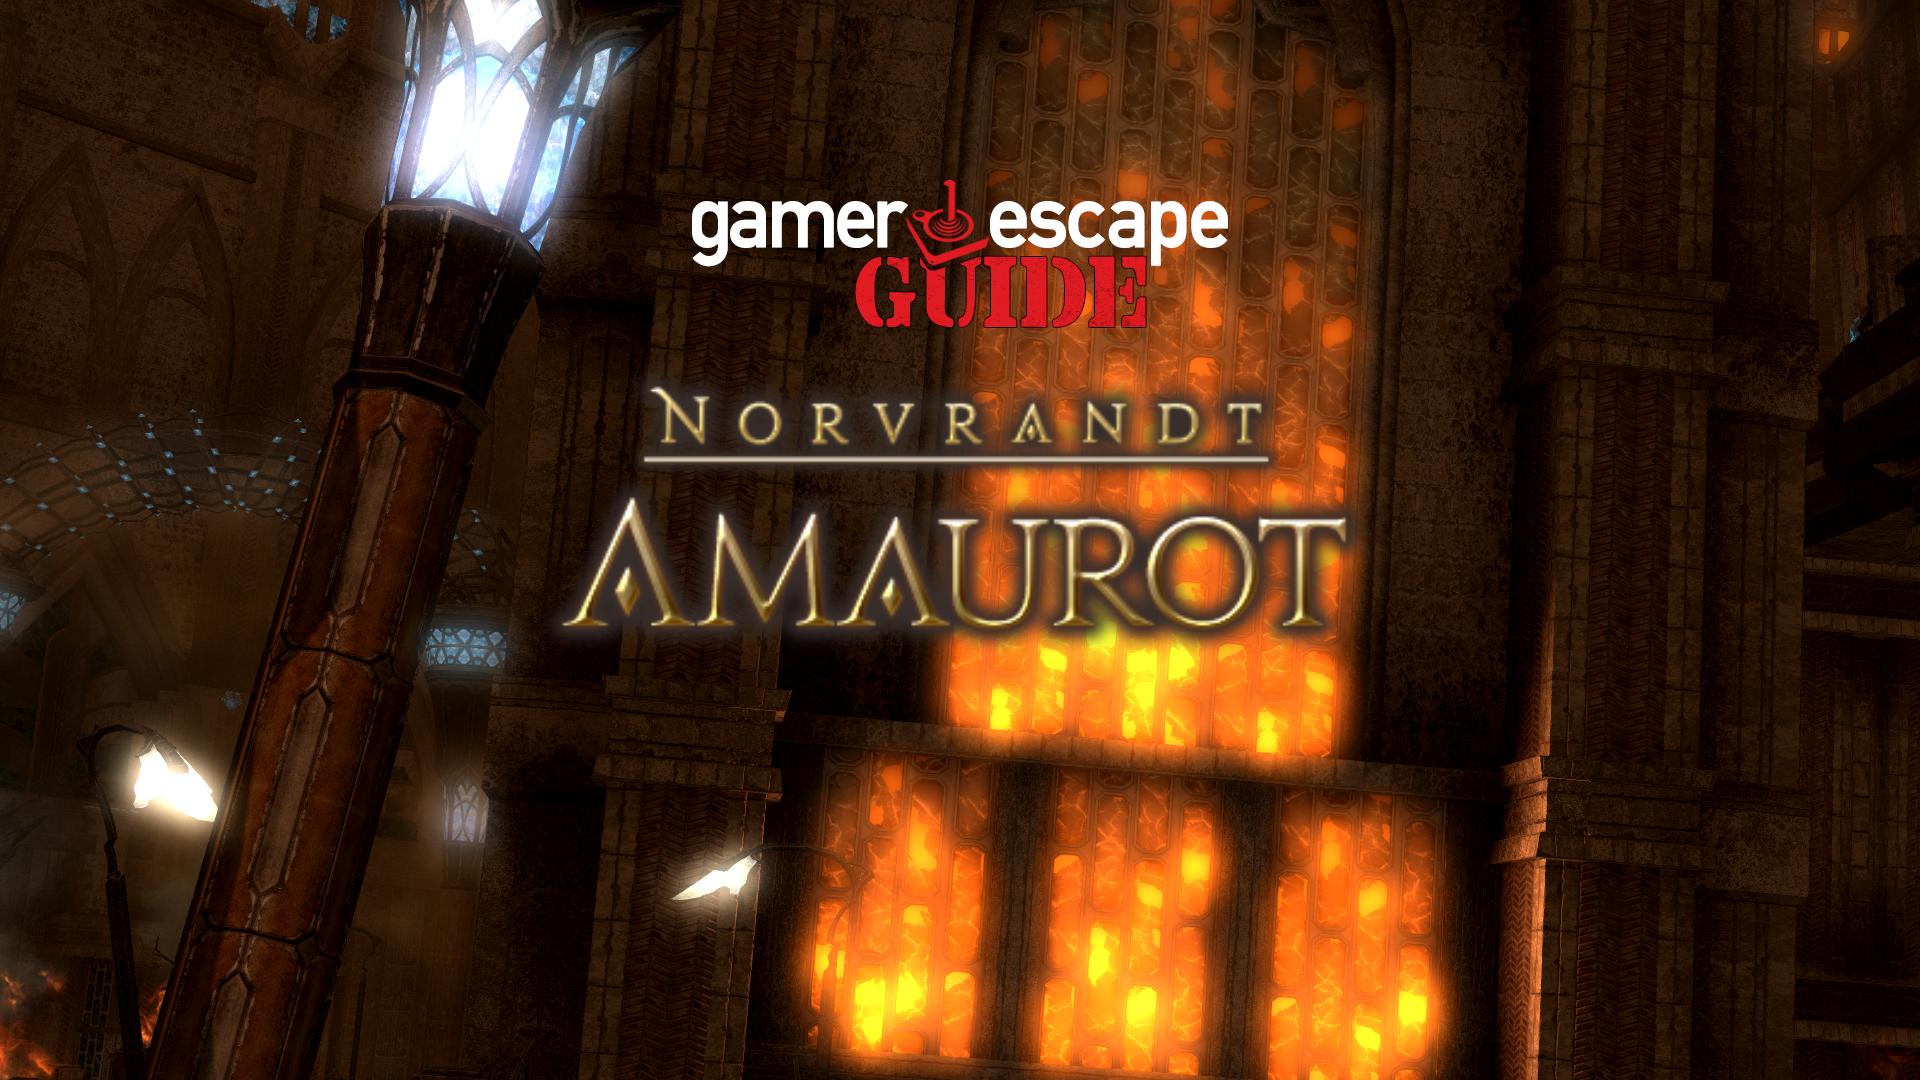 FFXIV Shadowbringers Guide: Amaurot – Gamer Escape: Gaming